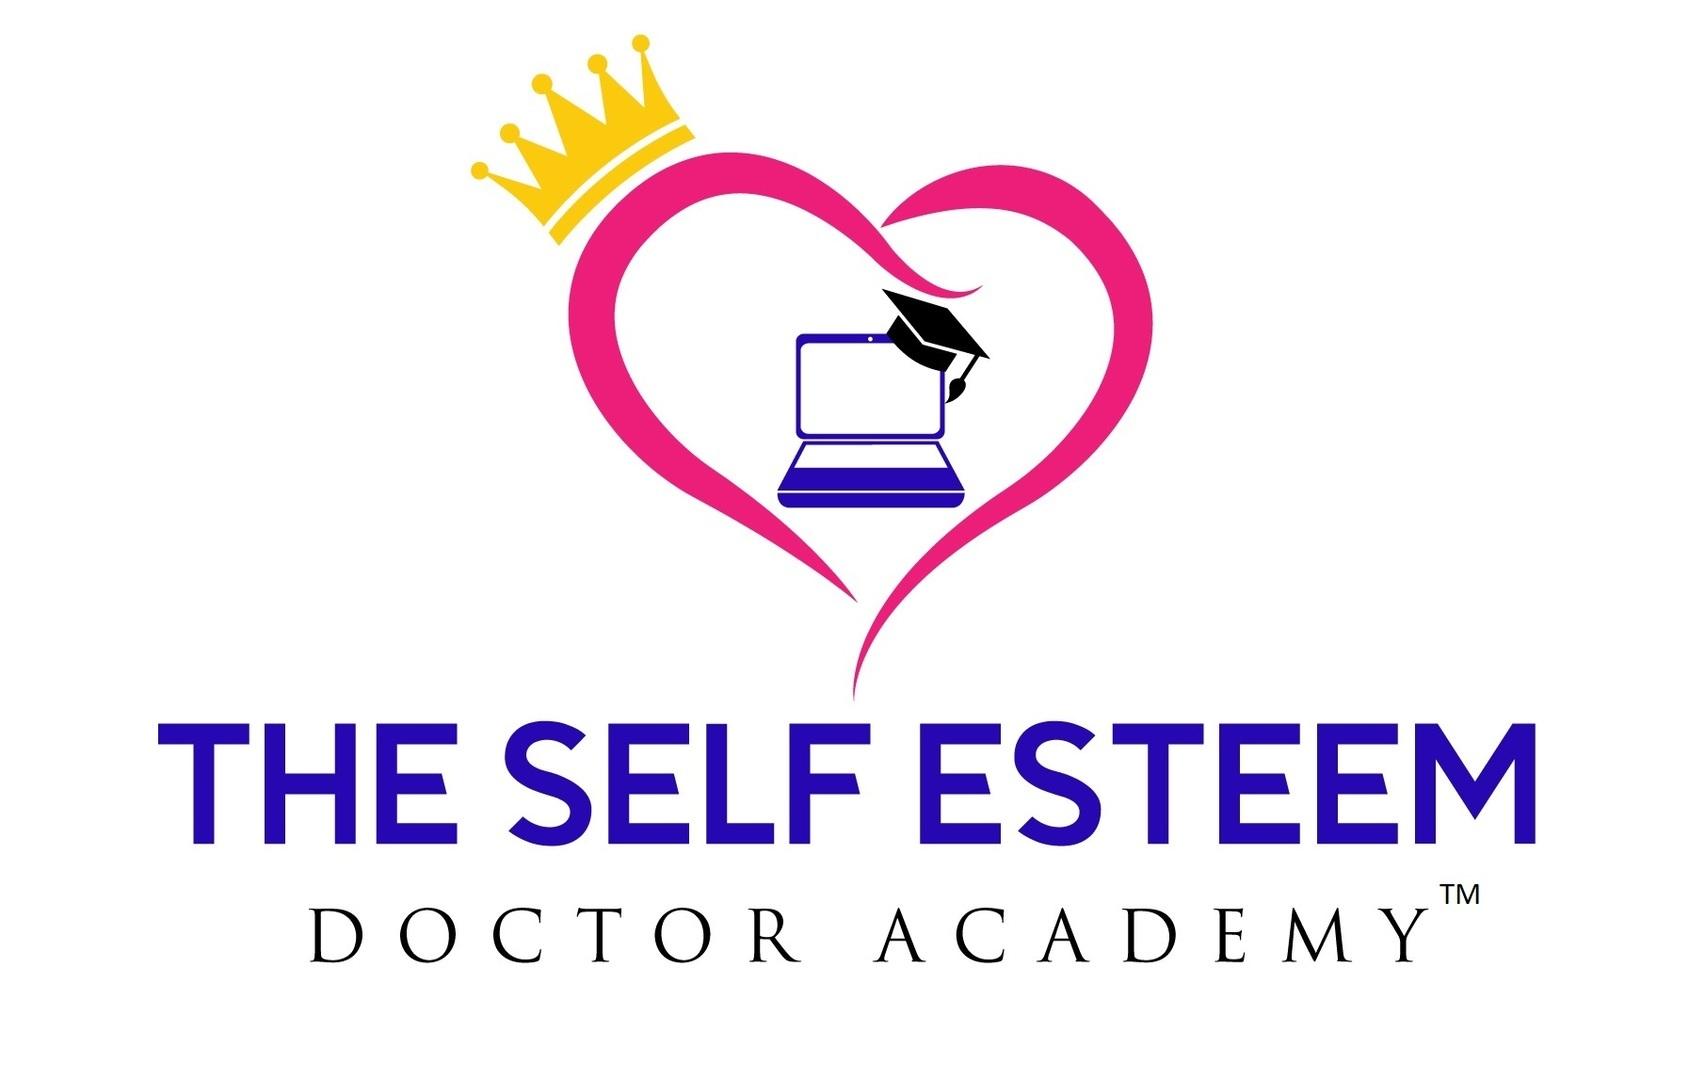 The Self Esteem Doctor Academy